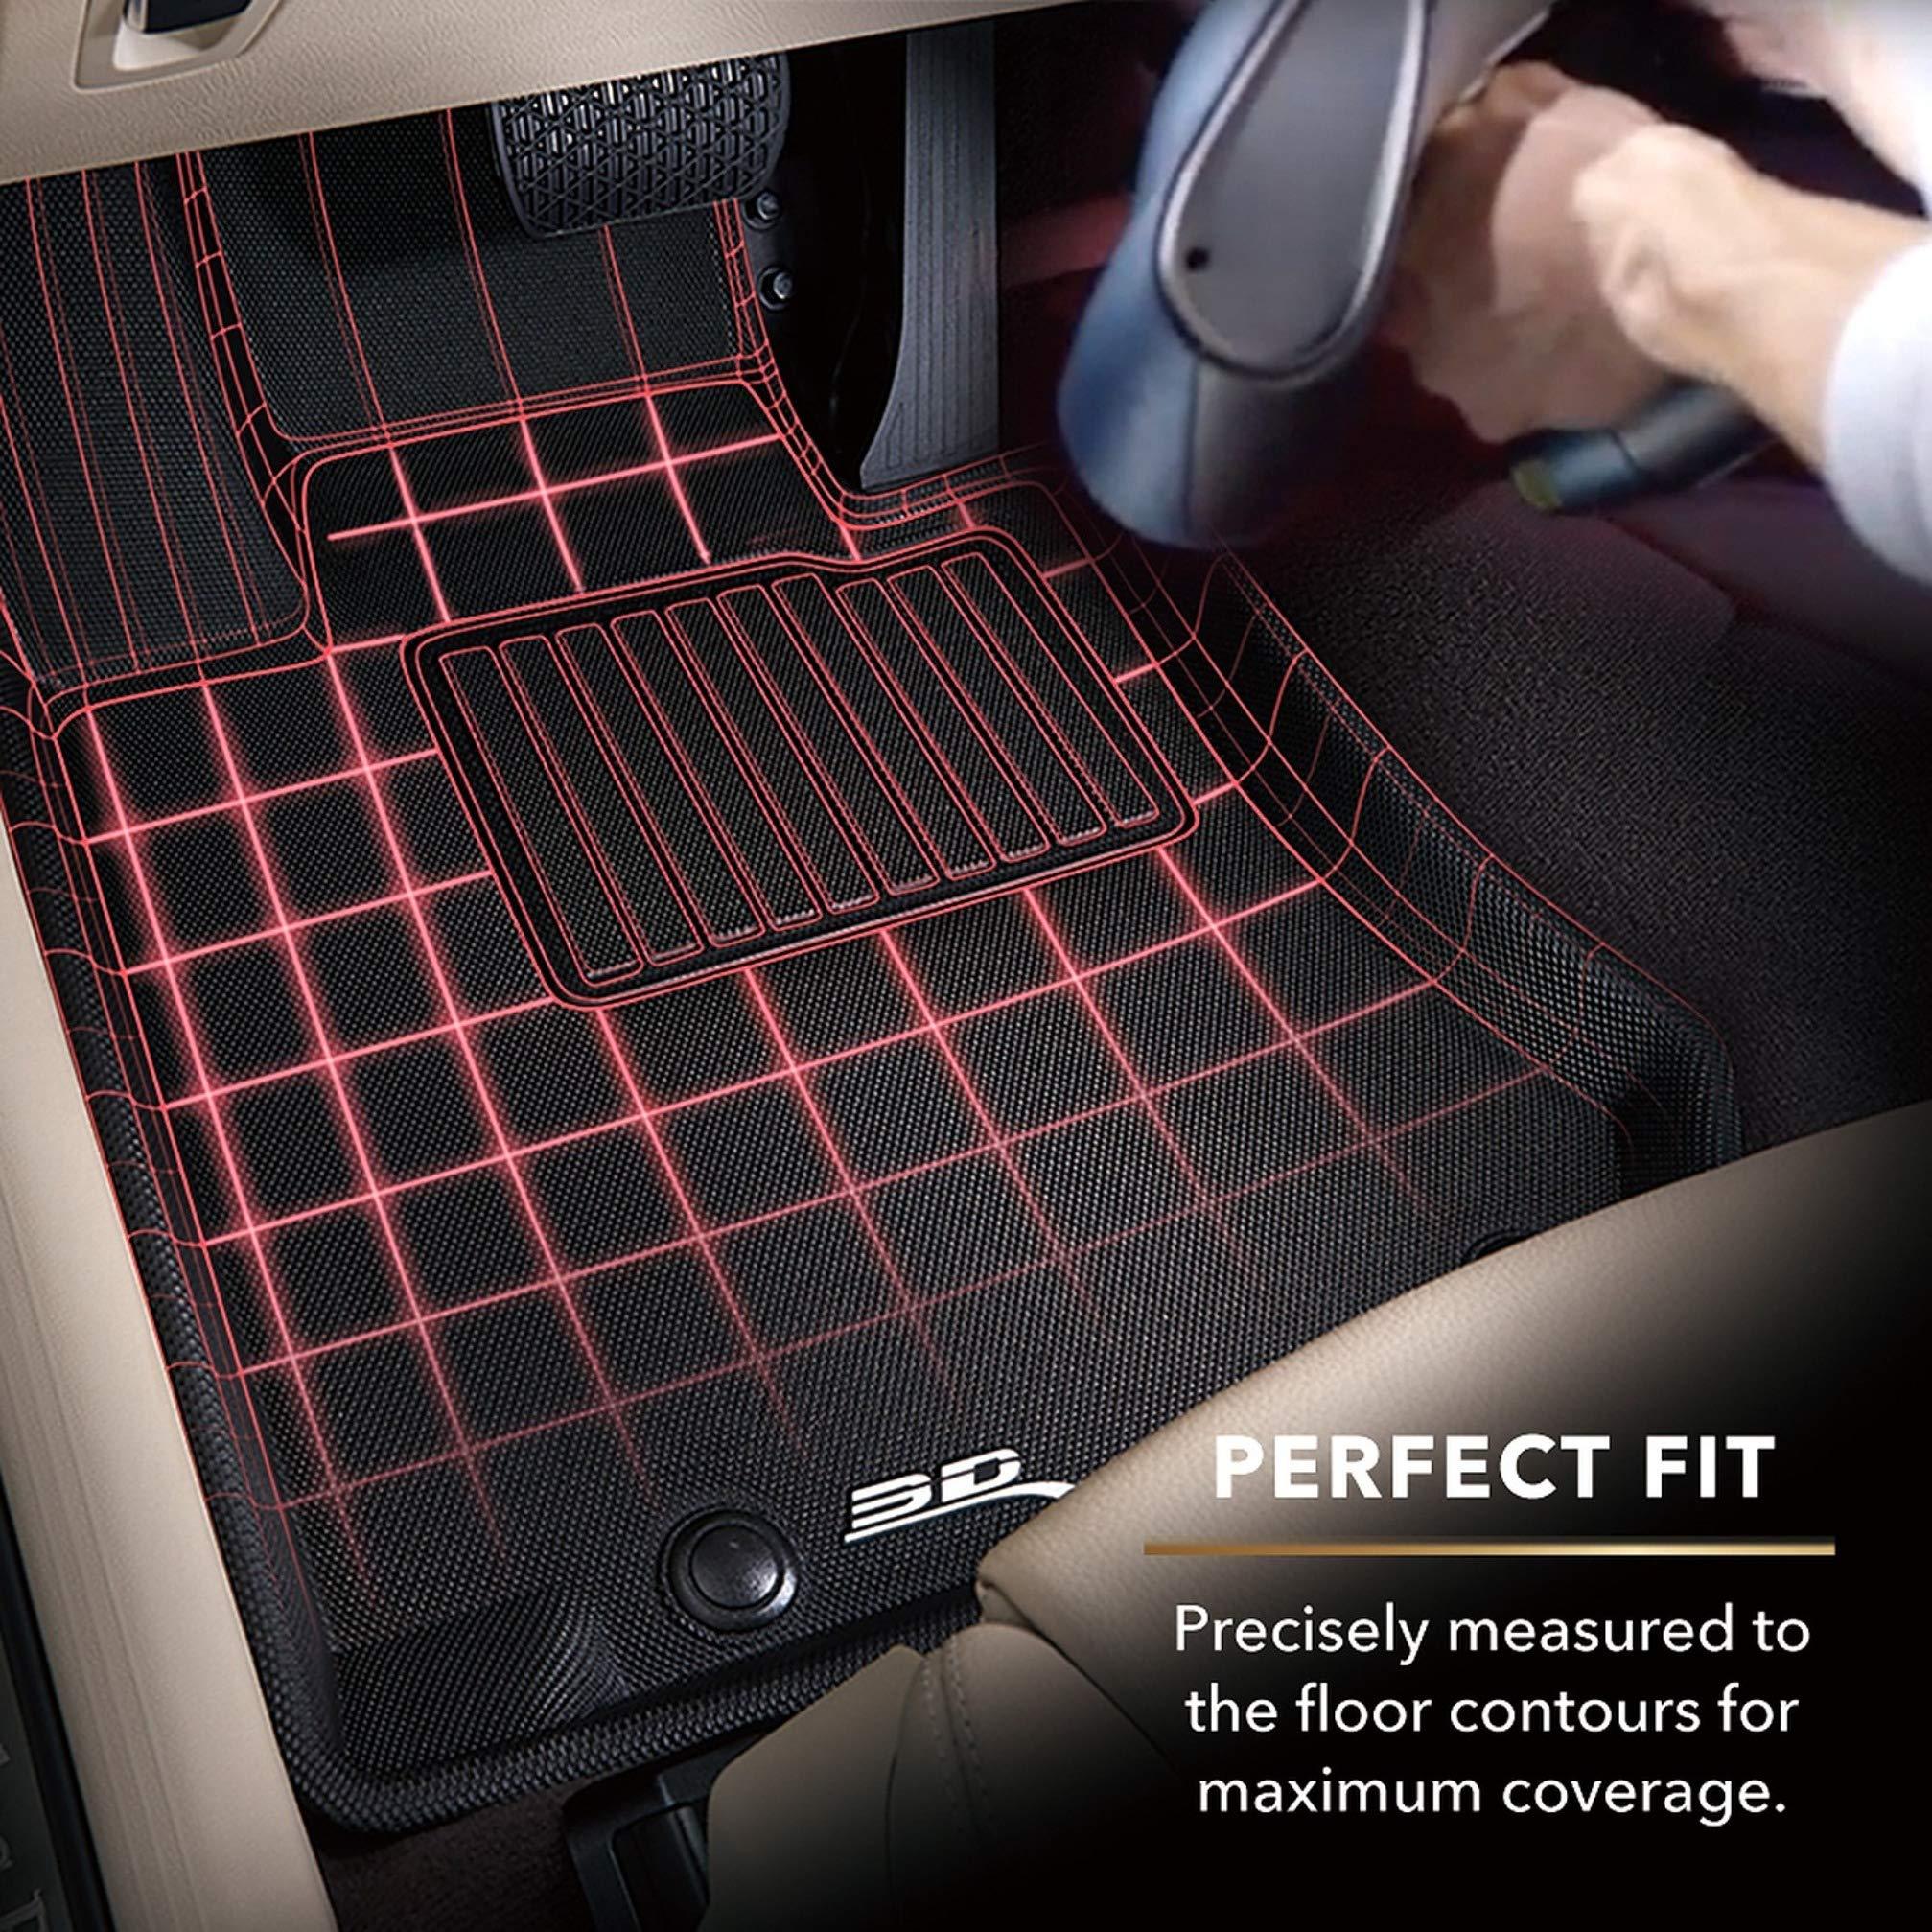 320i 330i All Weather Heavy Duty Floor Mat Set F30//F31 Autotech Park Custom Fit Car Floor Mat Compatible with 2012-2018 BMW 3 Series 340i M340i Rear Wheel Drive